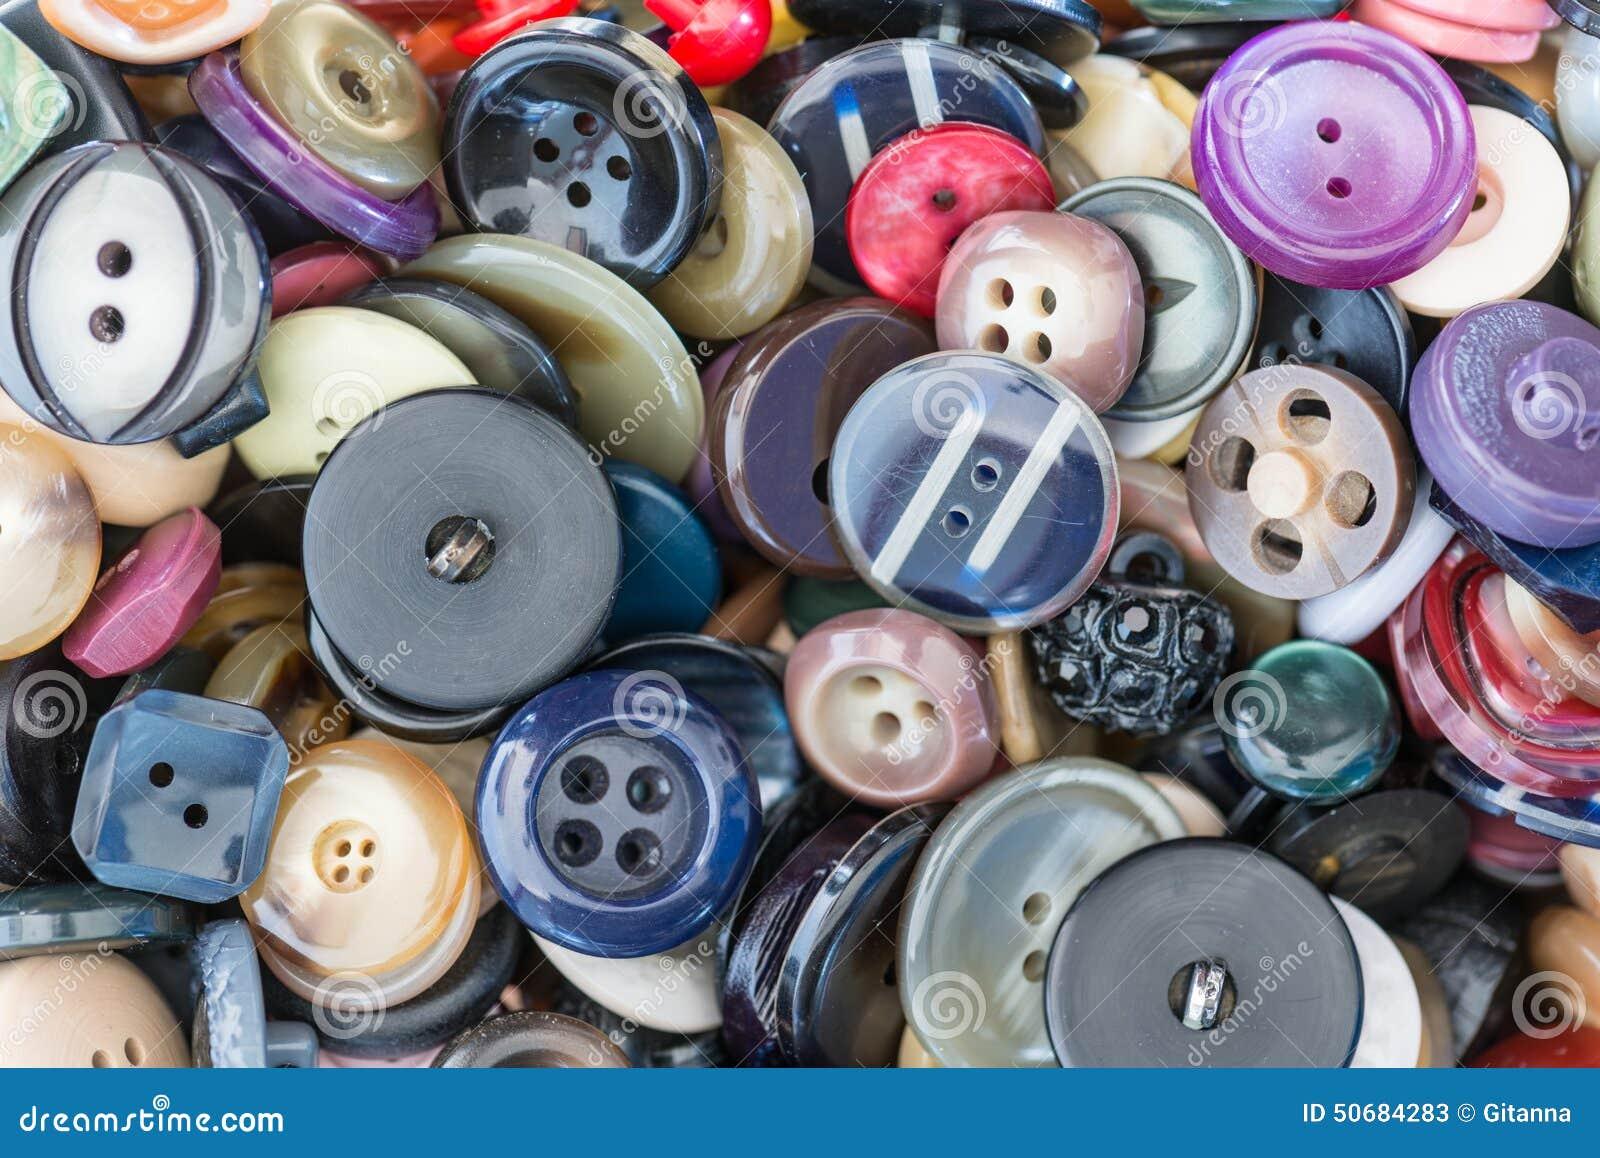 Download 衣裳的按钮 库存例证. 插画 包括有 grunge, 收集, 风土化, 织品, 礼服, browne, 详细资料 - 50684283